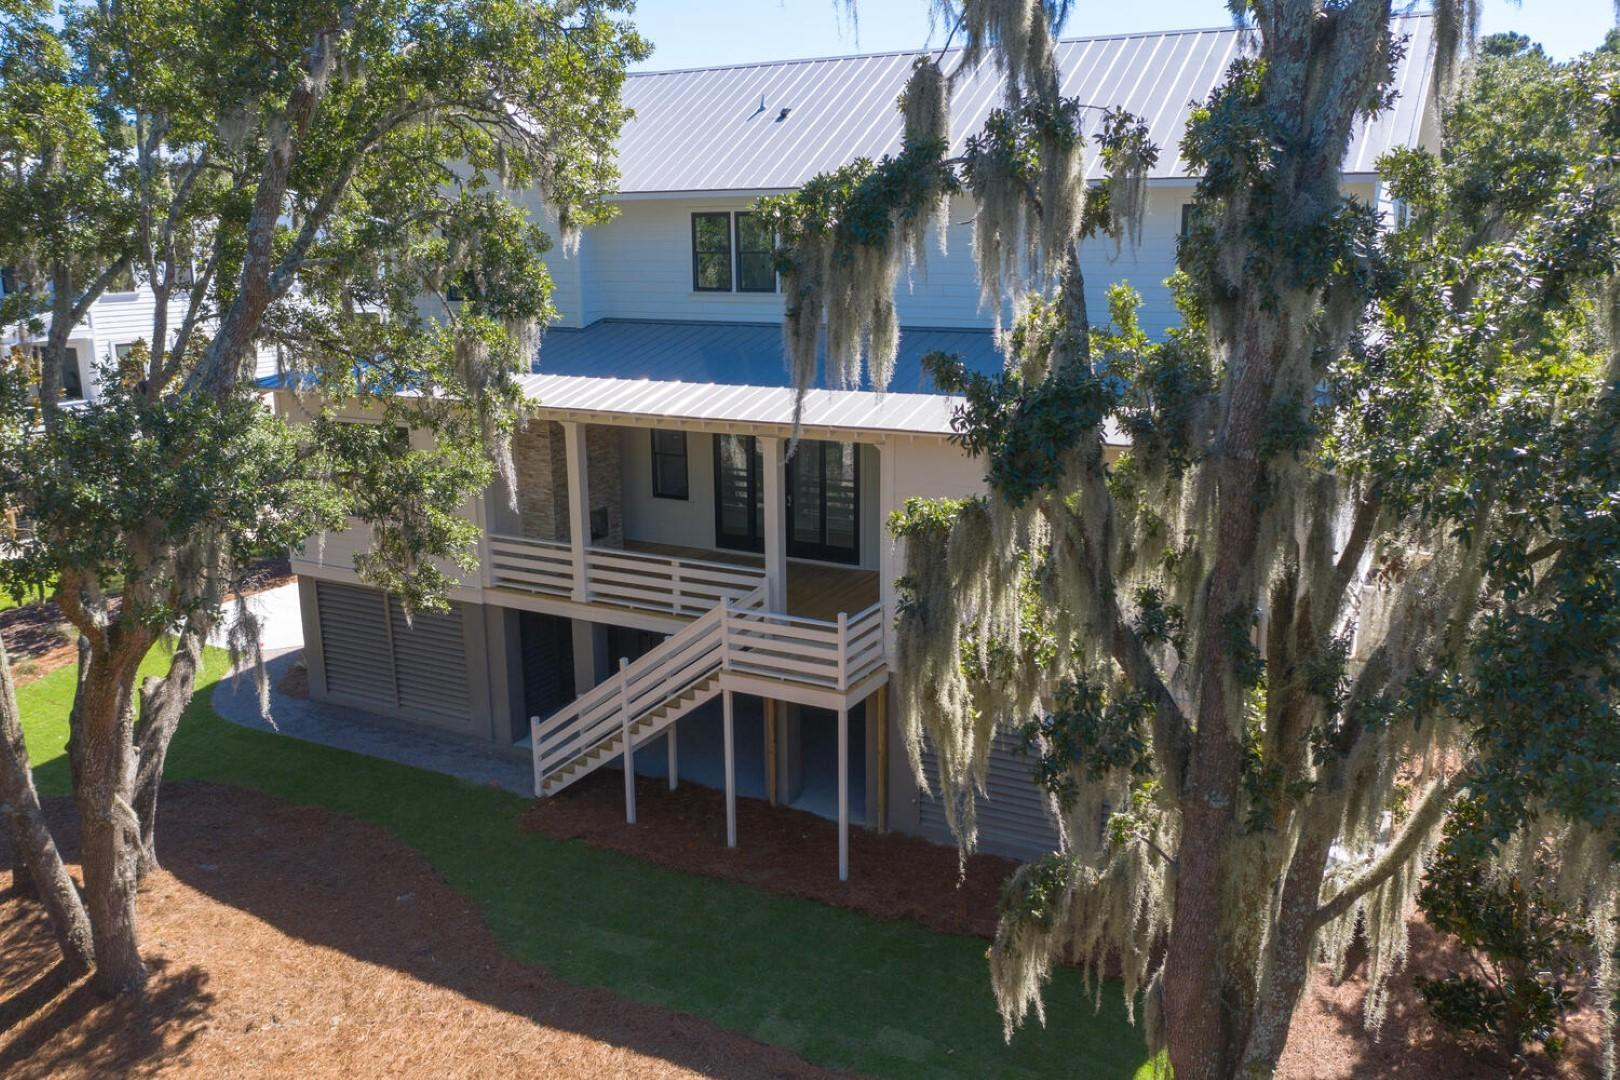 Scanlonville Homes For Sale - 156 5th, Mount Pleasant, SC - 53